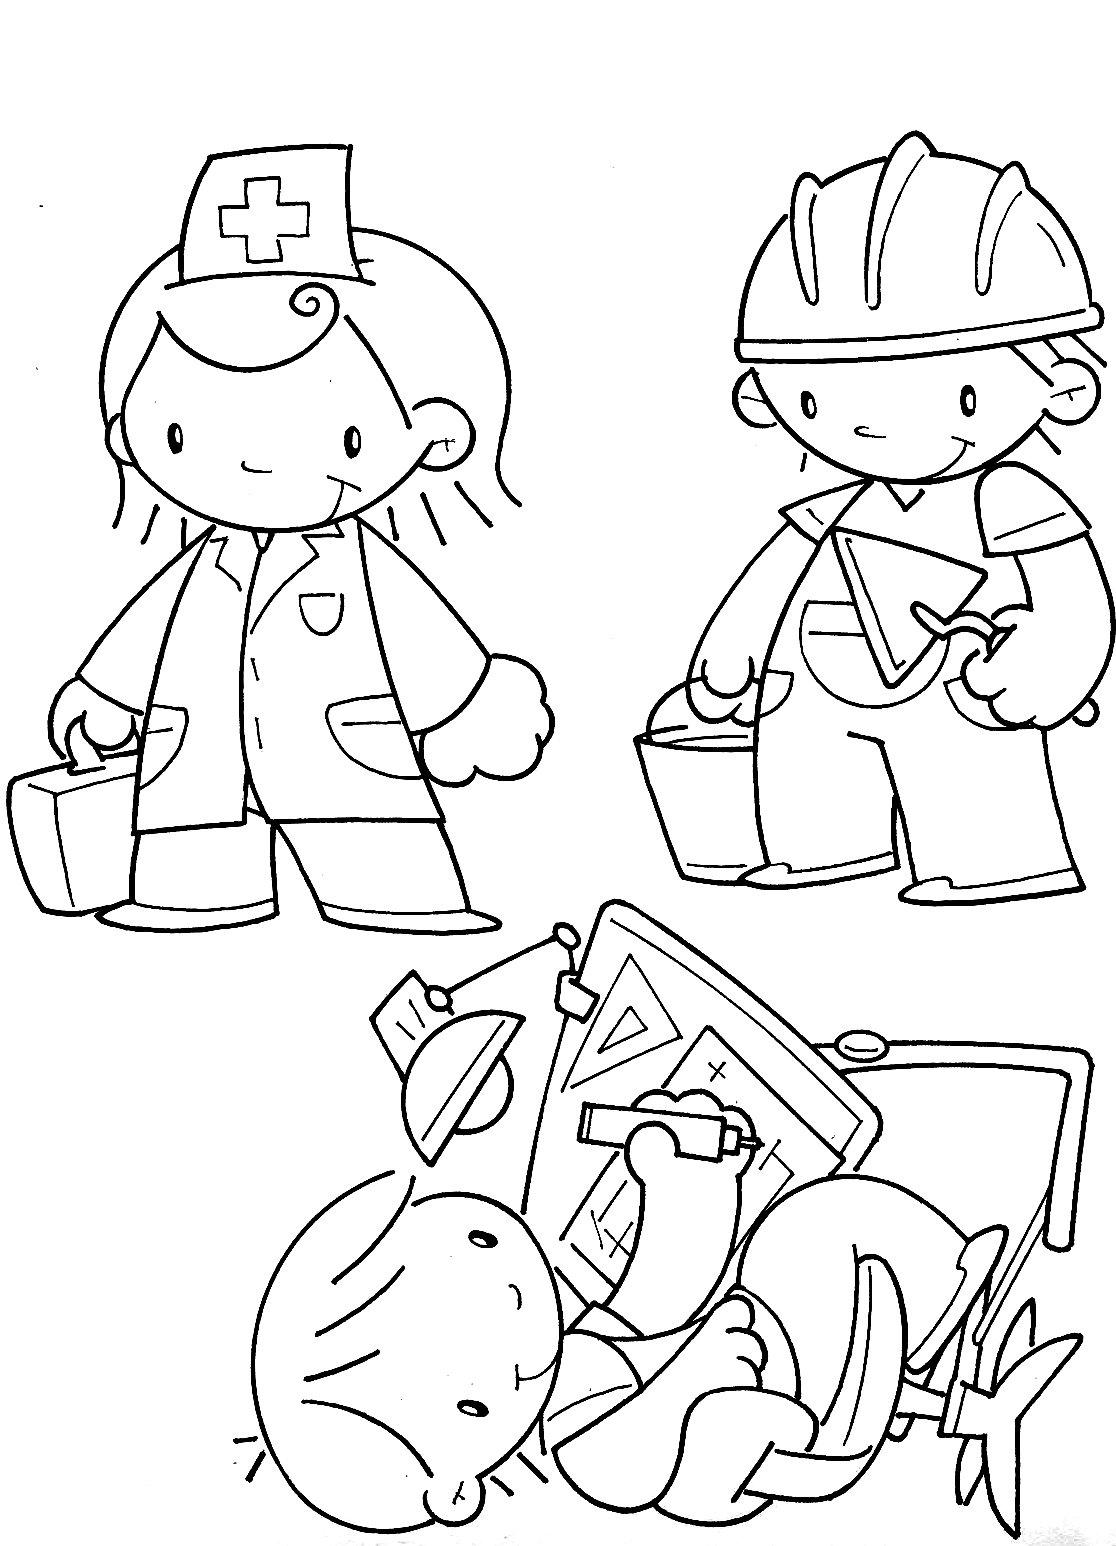 http://1.bp.blogspot.com/-hRoz88q1U7o/T5mwfY6IlGI/AAAAAAAAGj4/5P8OO2FJwcg/s1600/desenhos+profissoes+colorir+imprimir.jpg